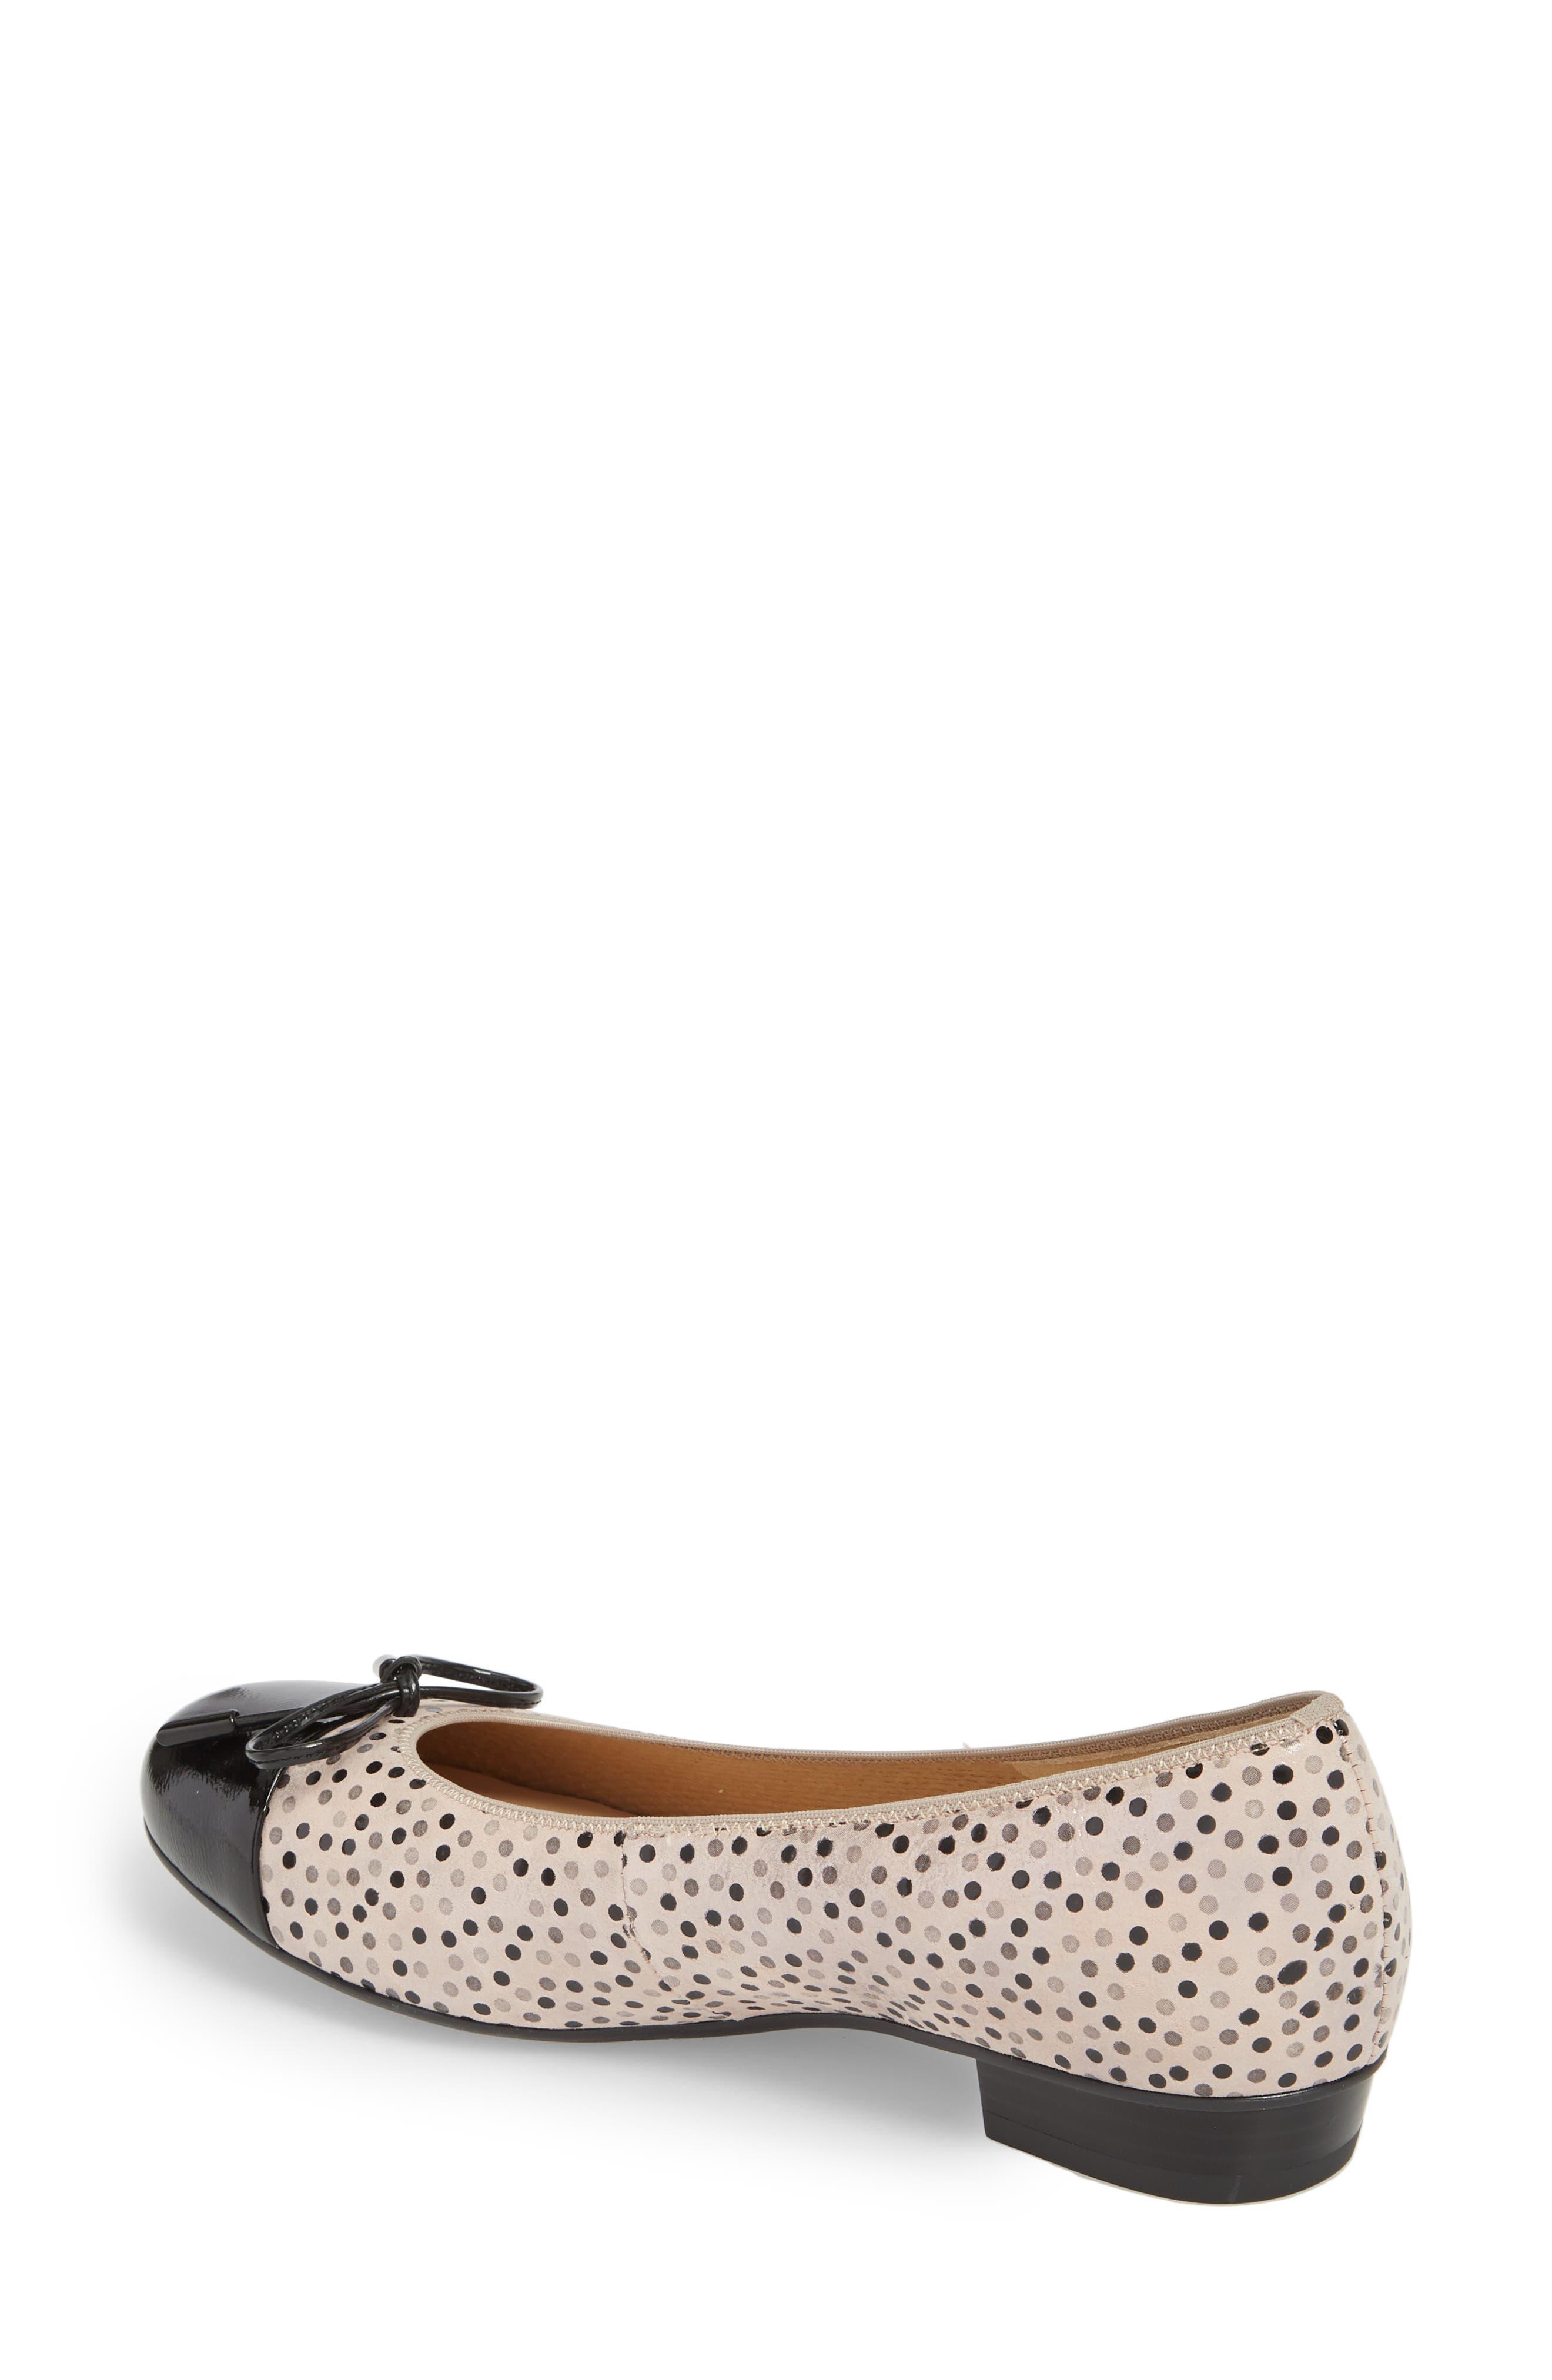 'Betty' Cap Toe Flat,                             Alternate thumbnail 2, color,                             Black Polka Dot Leather